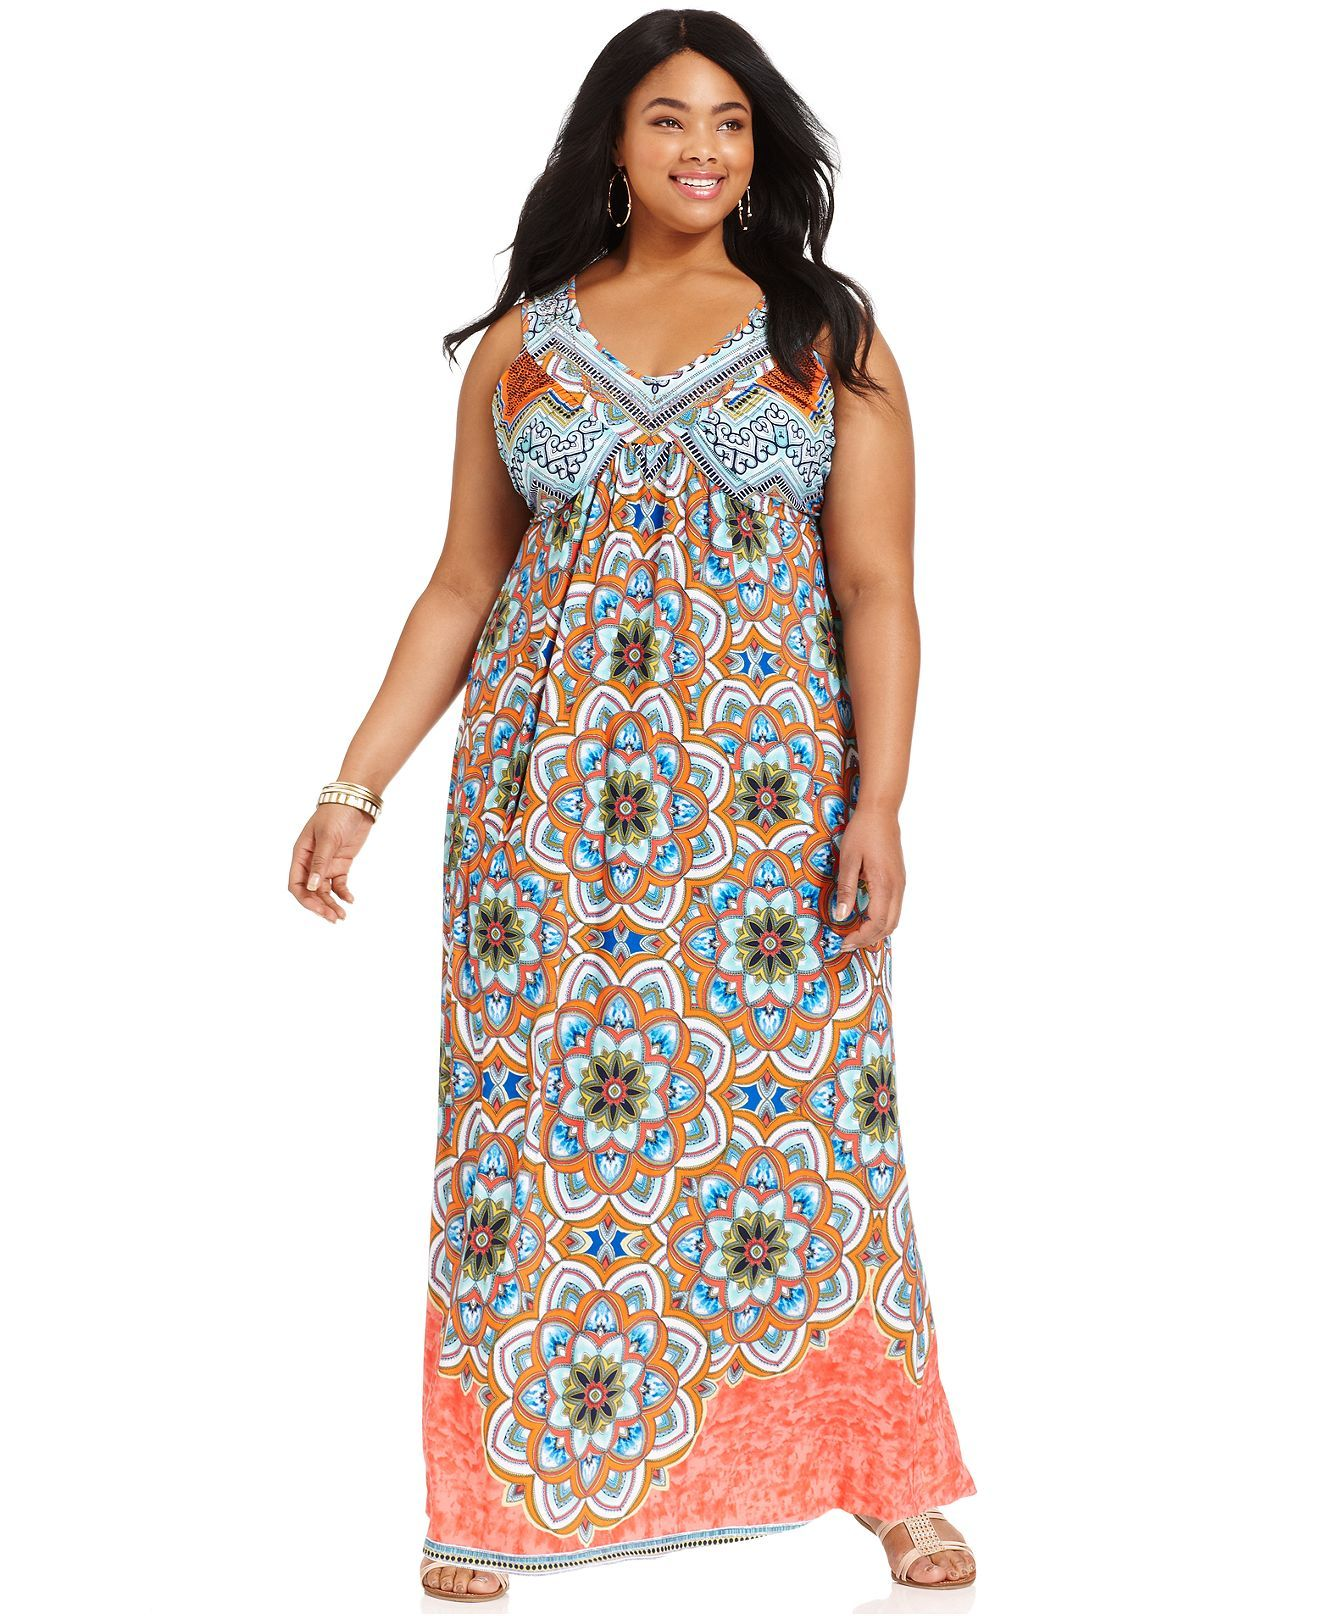 One World Plus Size Dress | Plus size maxi dresses, Fashion ...